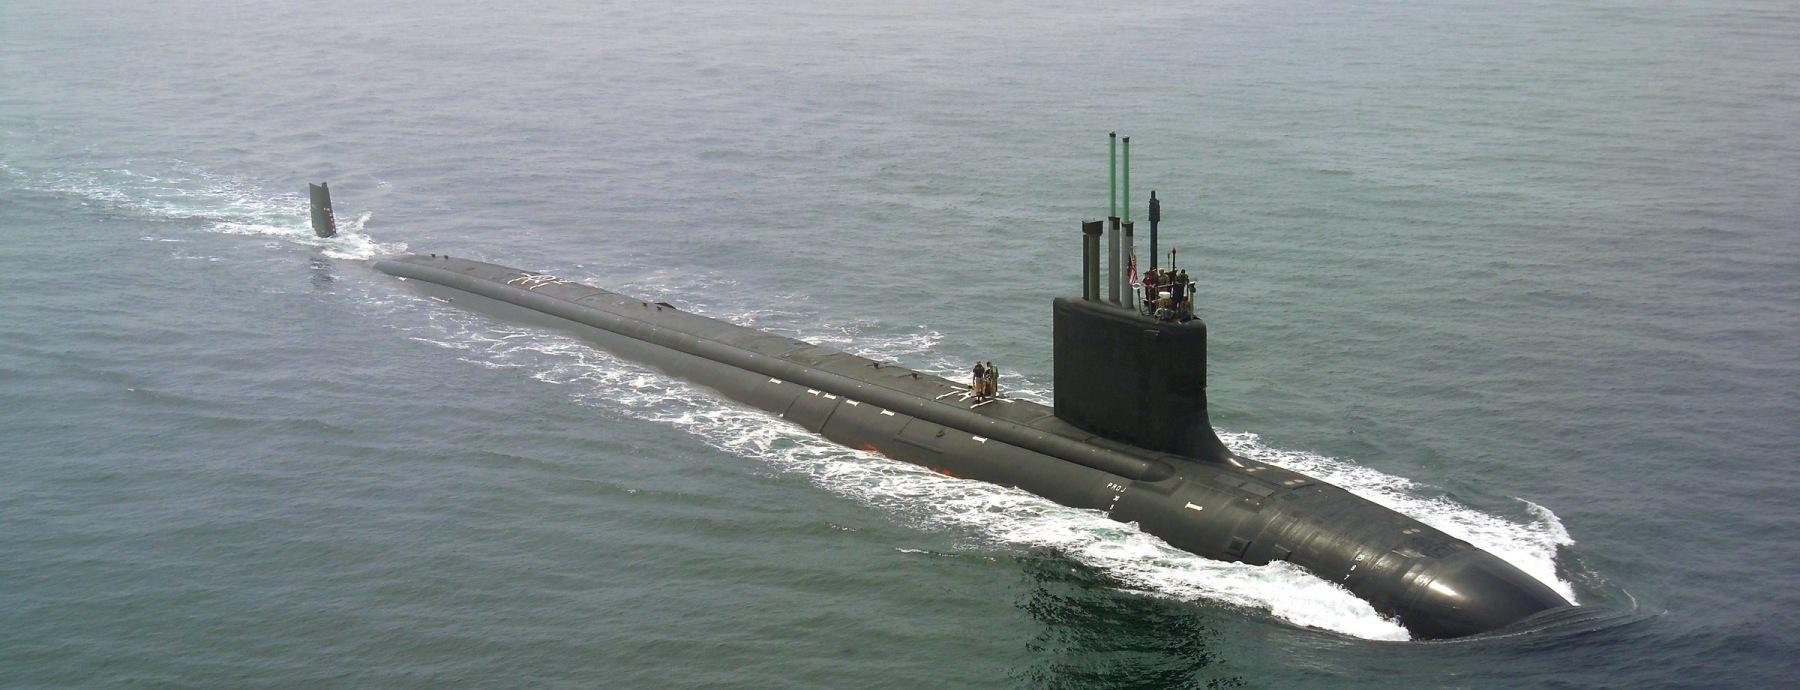 USS_Virginia.thumb.jpg.7bf9435ea8bc7c267e57e40d1a2de33d.jpg